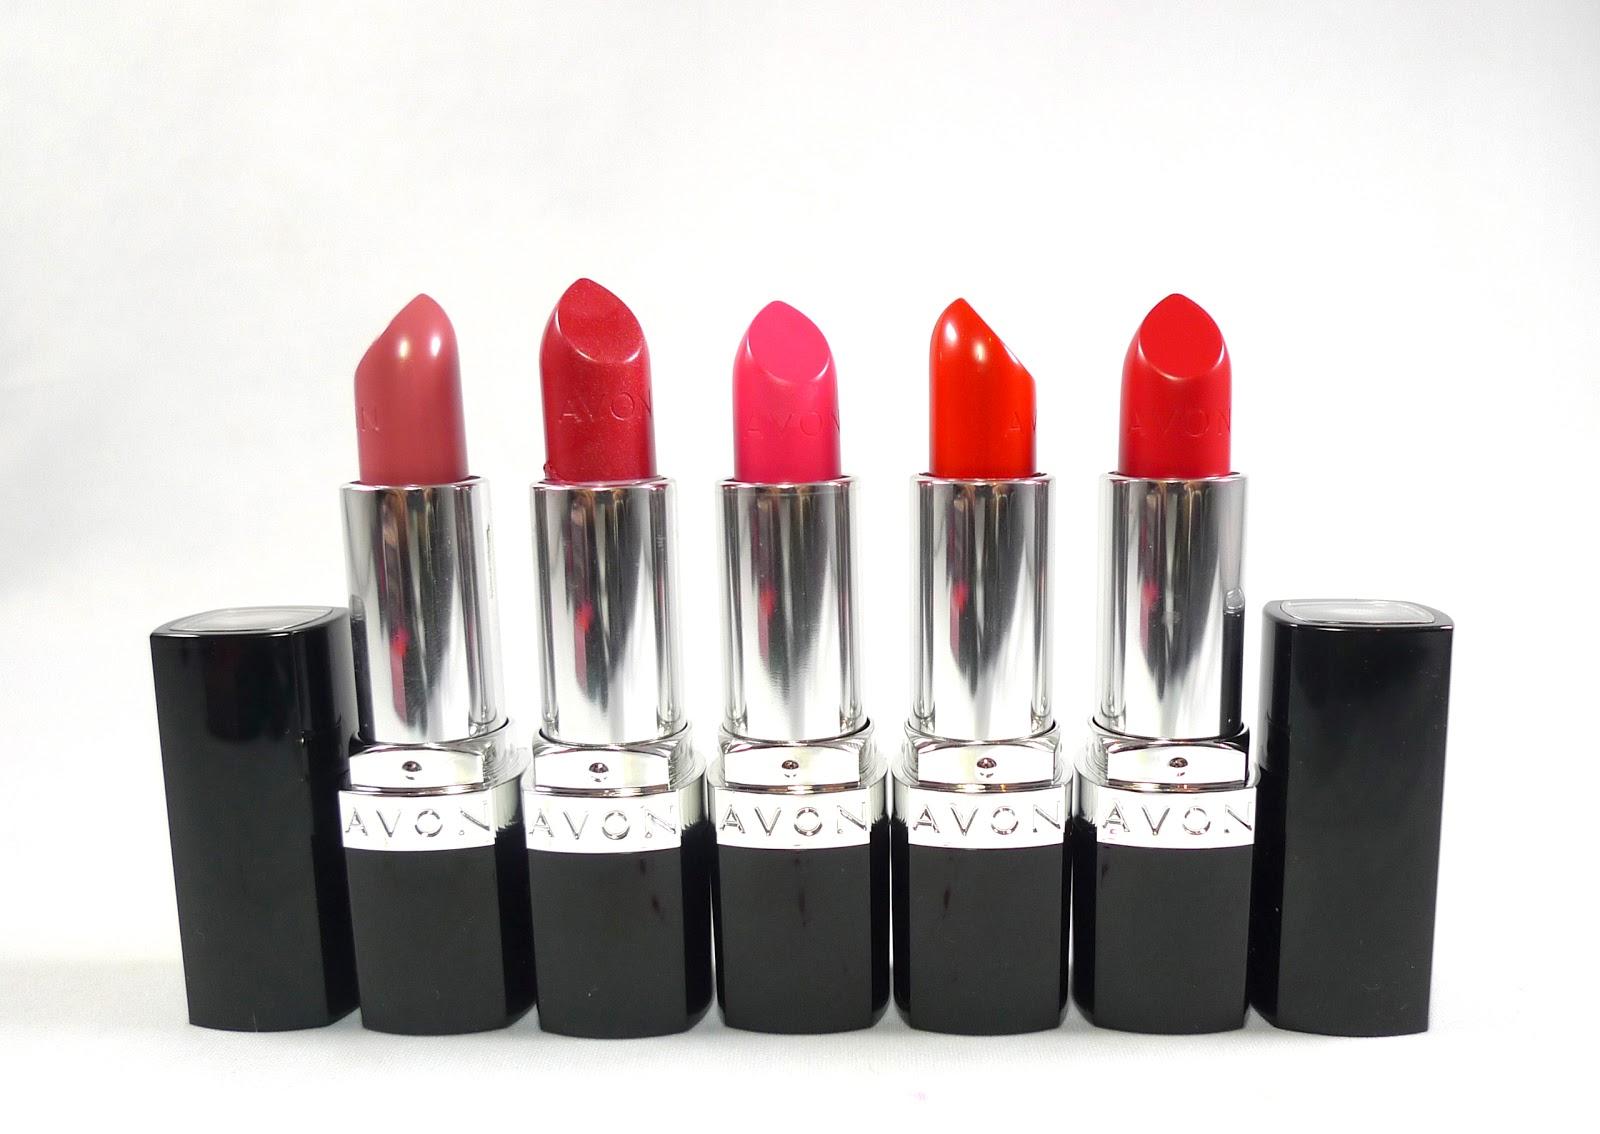 Review: Avon Ultra Color Lipsticks